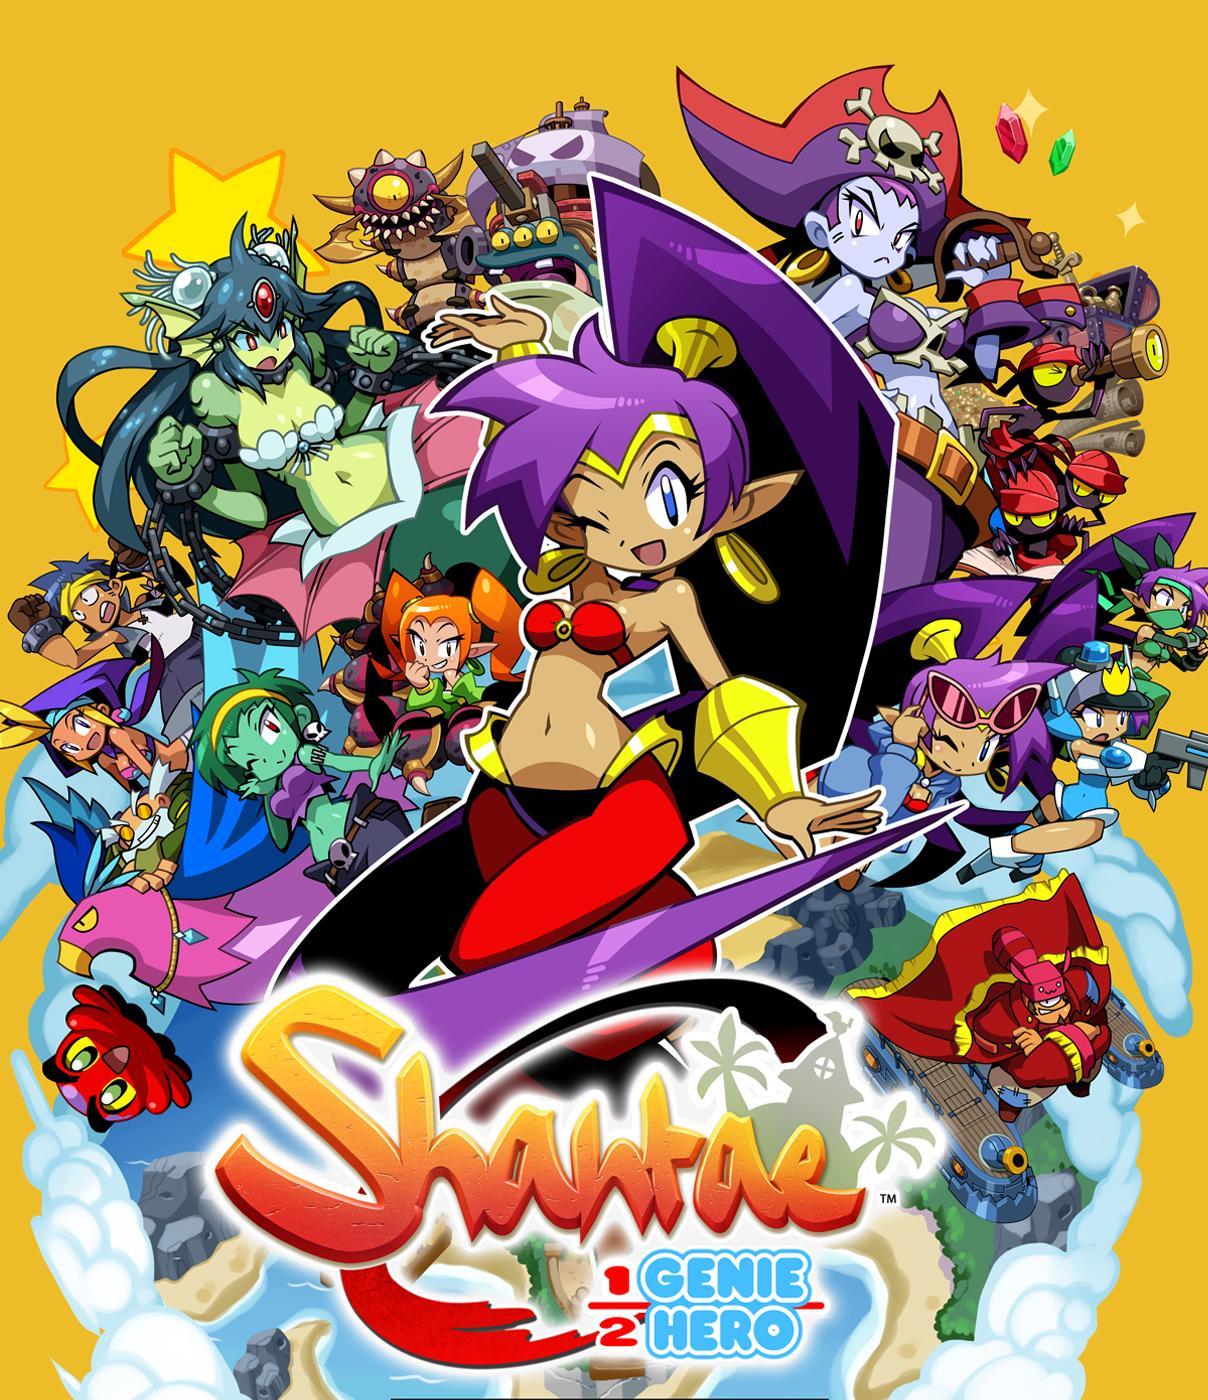 shantae-half-genie-hero.png